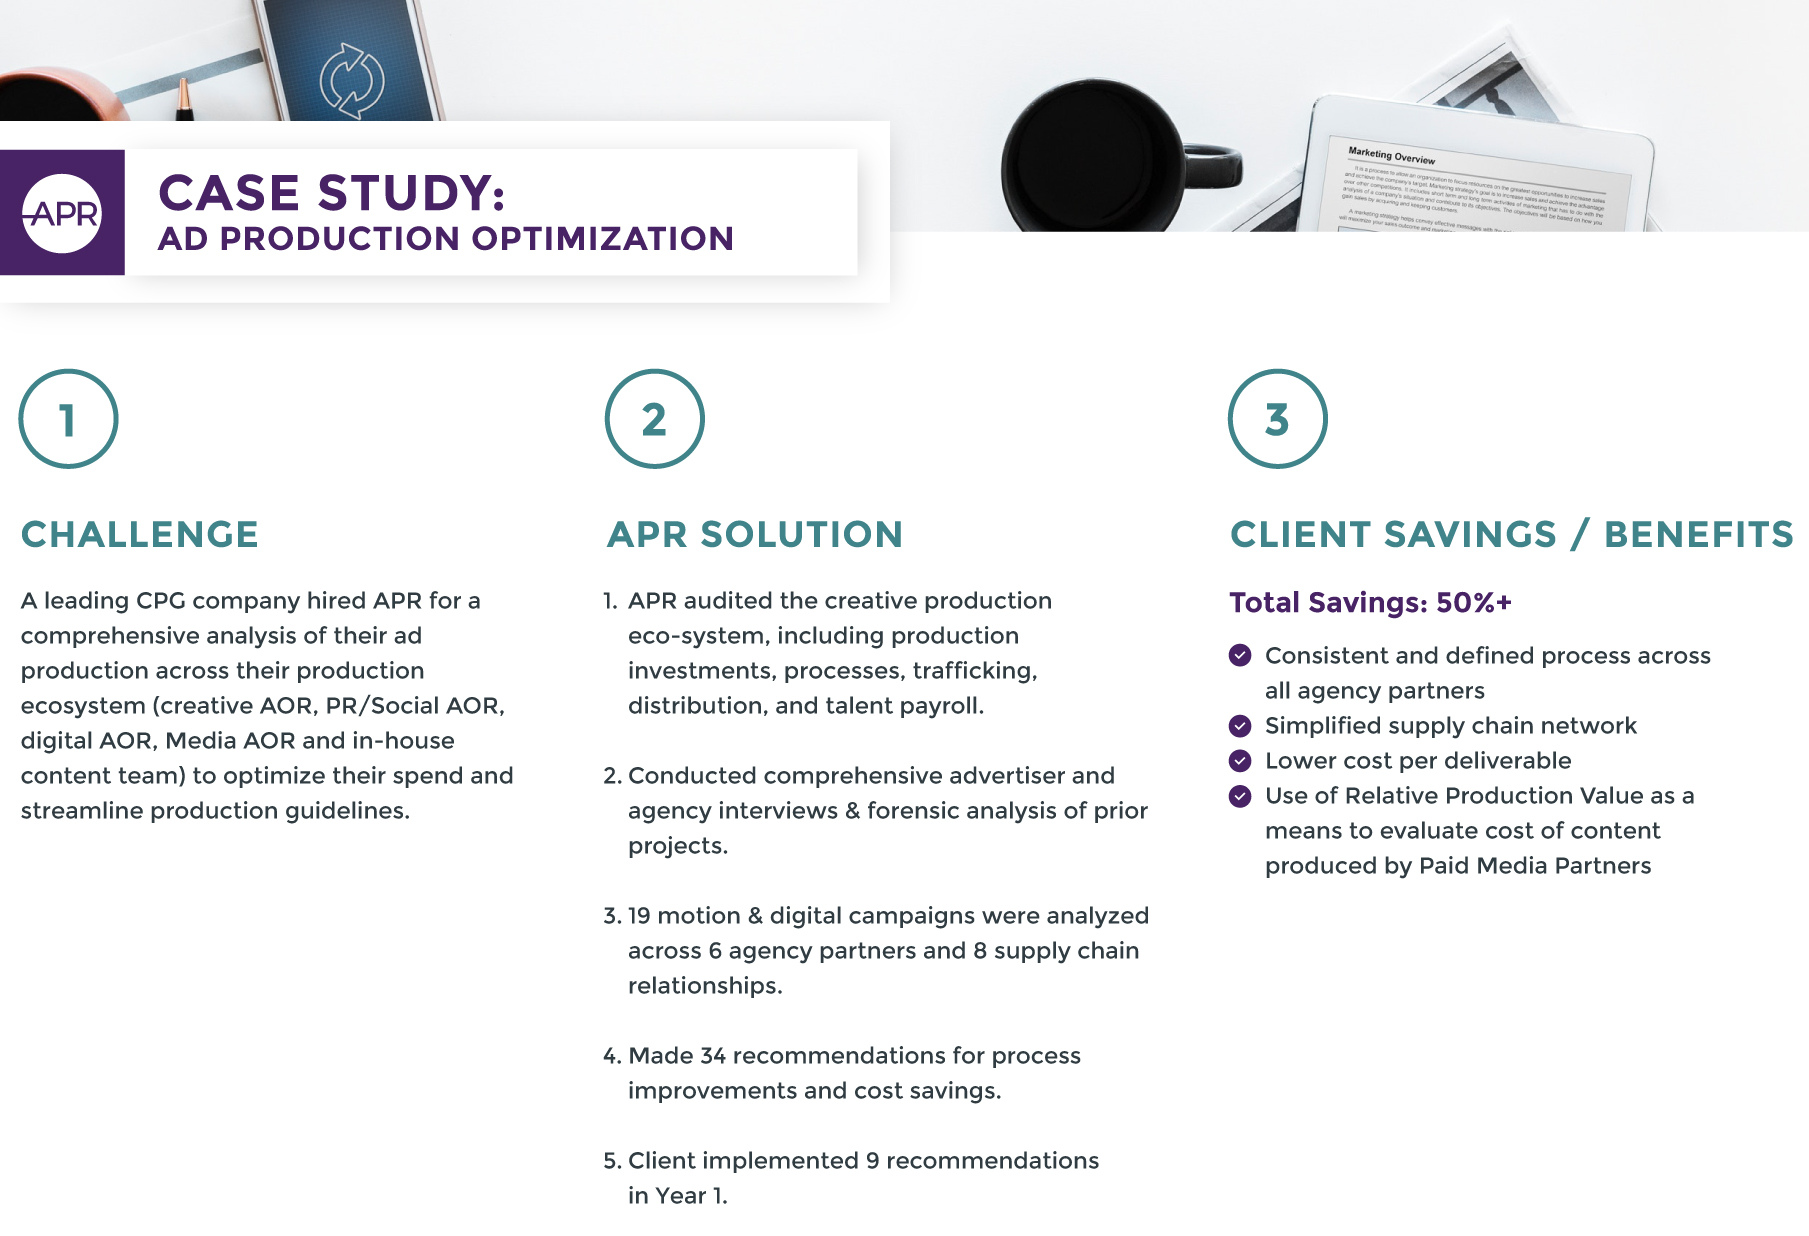 APR_CS_Ad_Production_Optimization.jpg